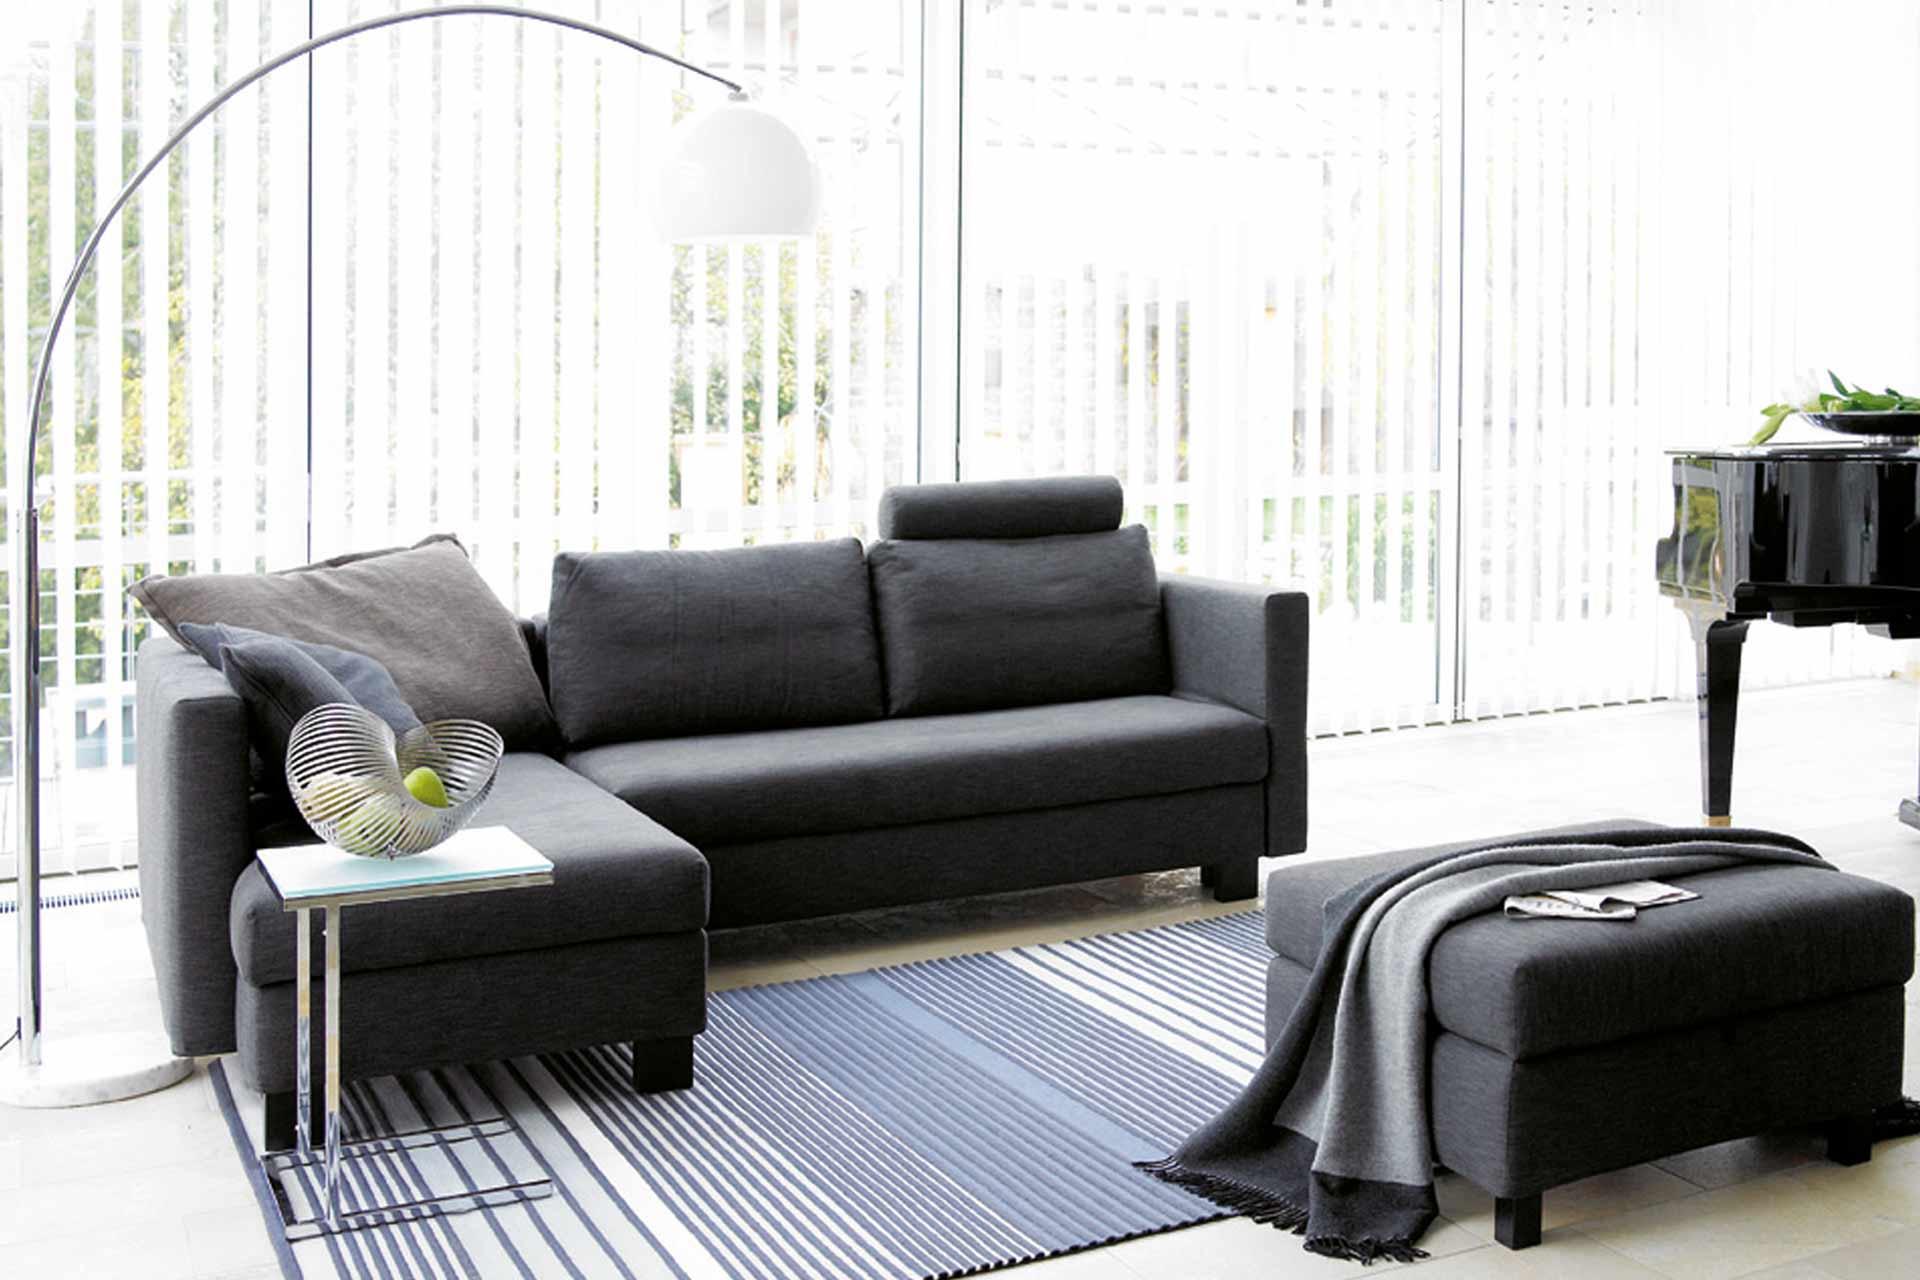 schlafsofaecke linus incl funktionskissen wohnopposition berlin. Black Bedroom Furniture Sets. Home Design Ideas